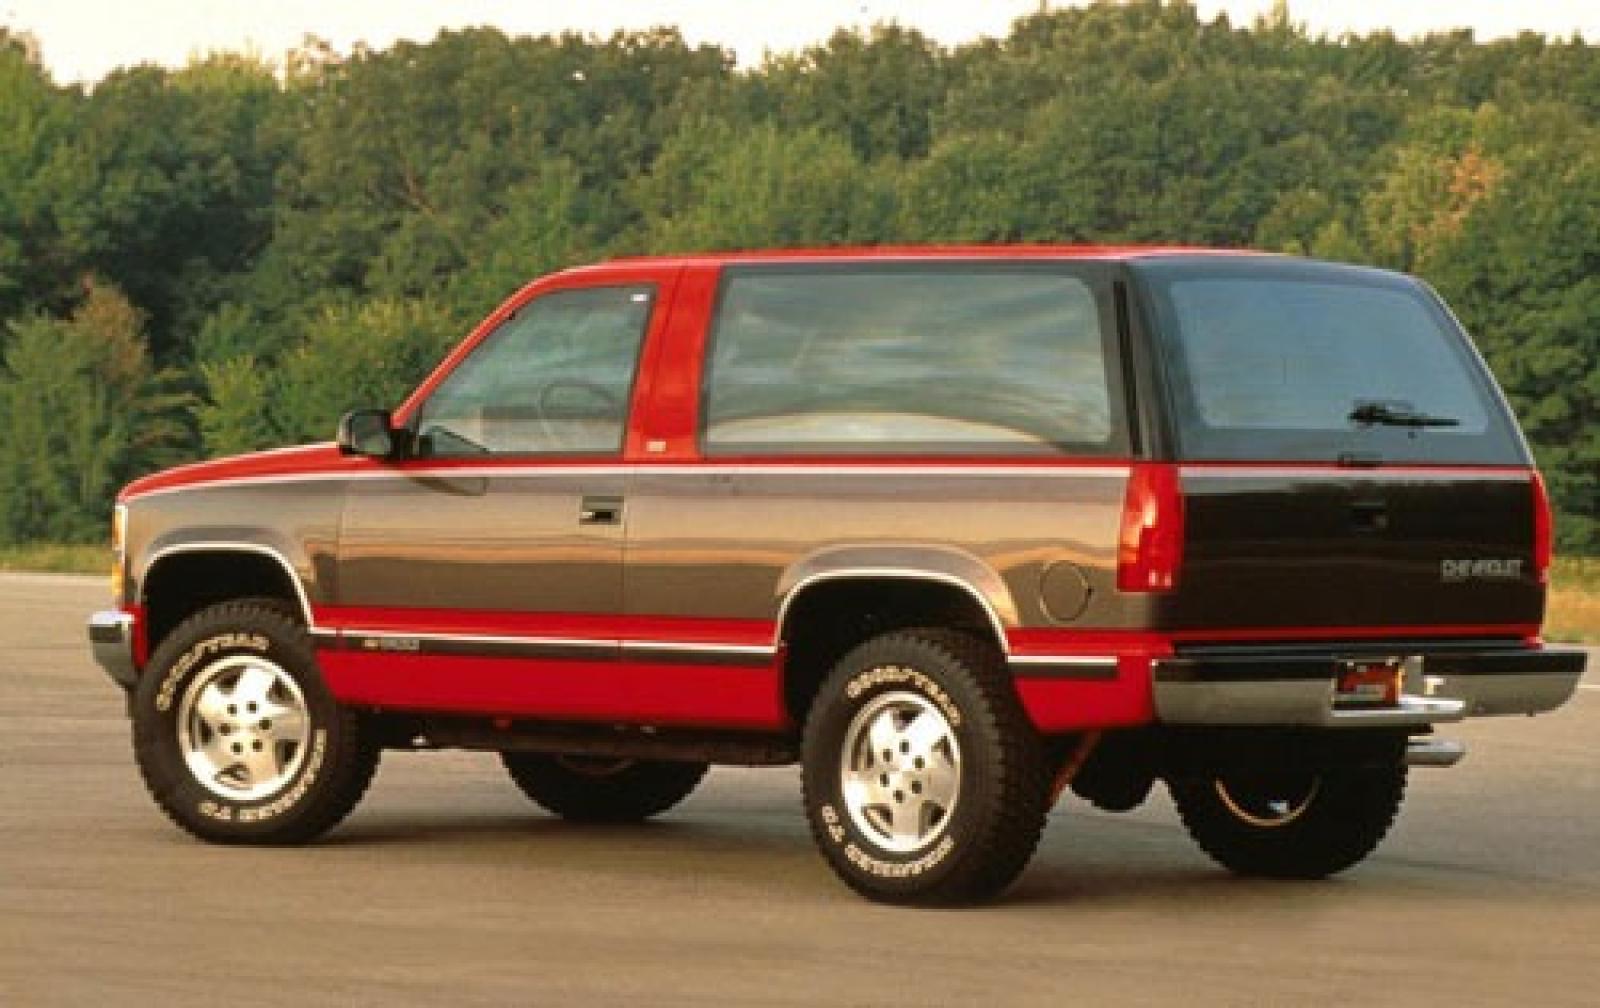 1993 Chevrolet Blazer Information And Photos Zombiedrive